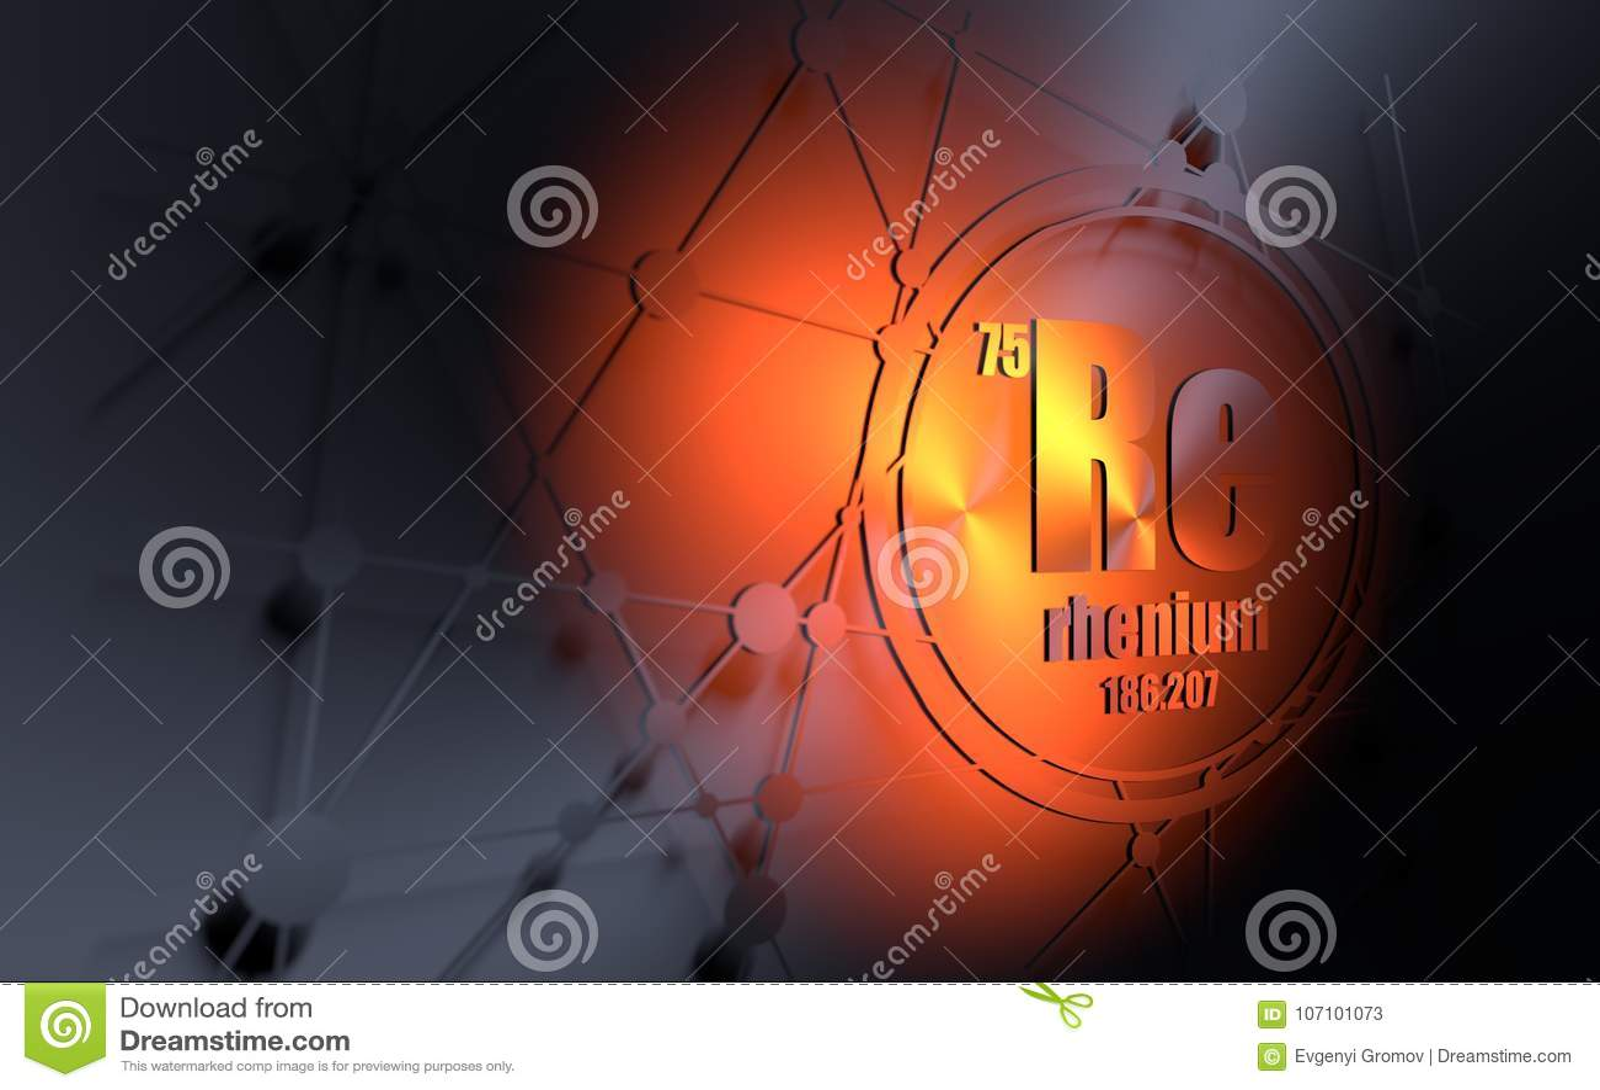 hight resolution of rhenium chemical element